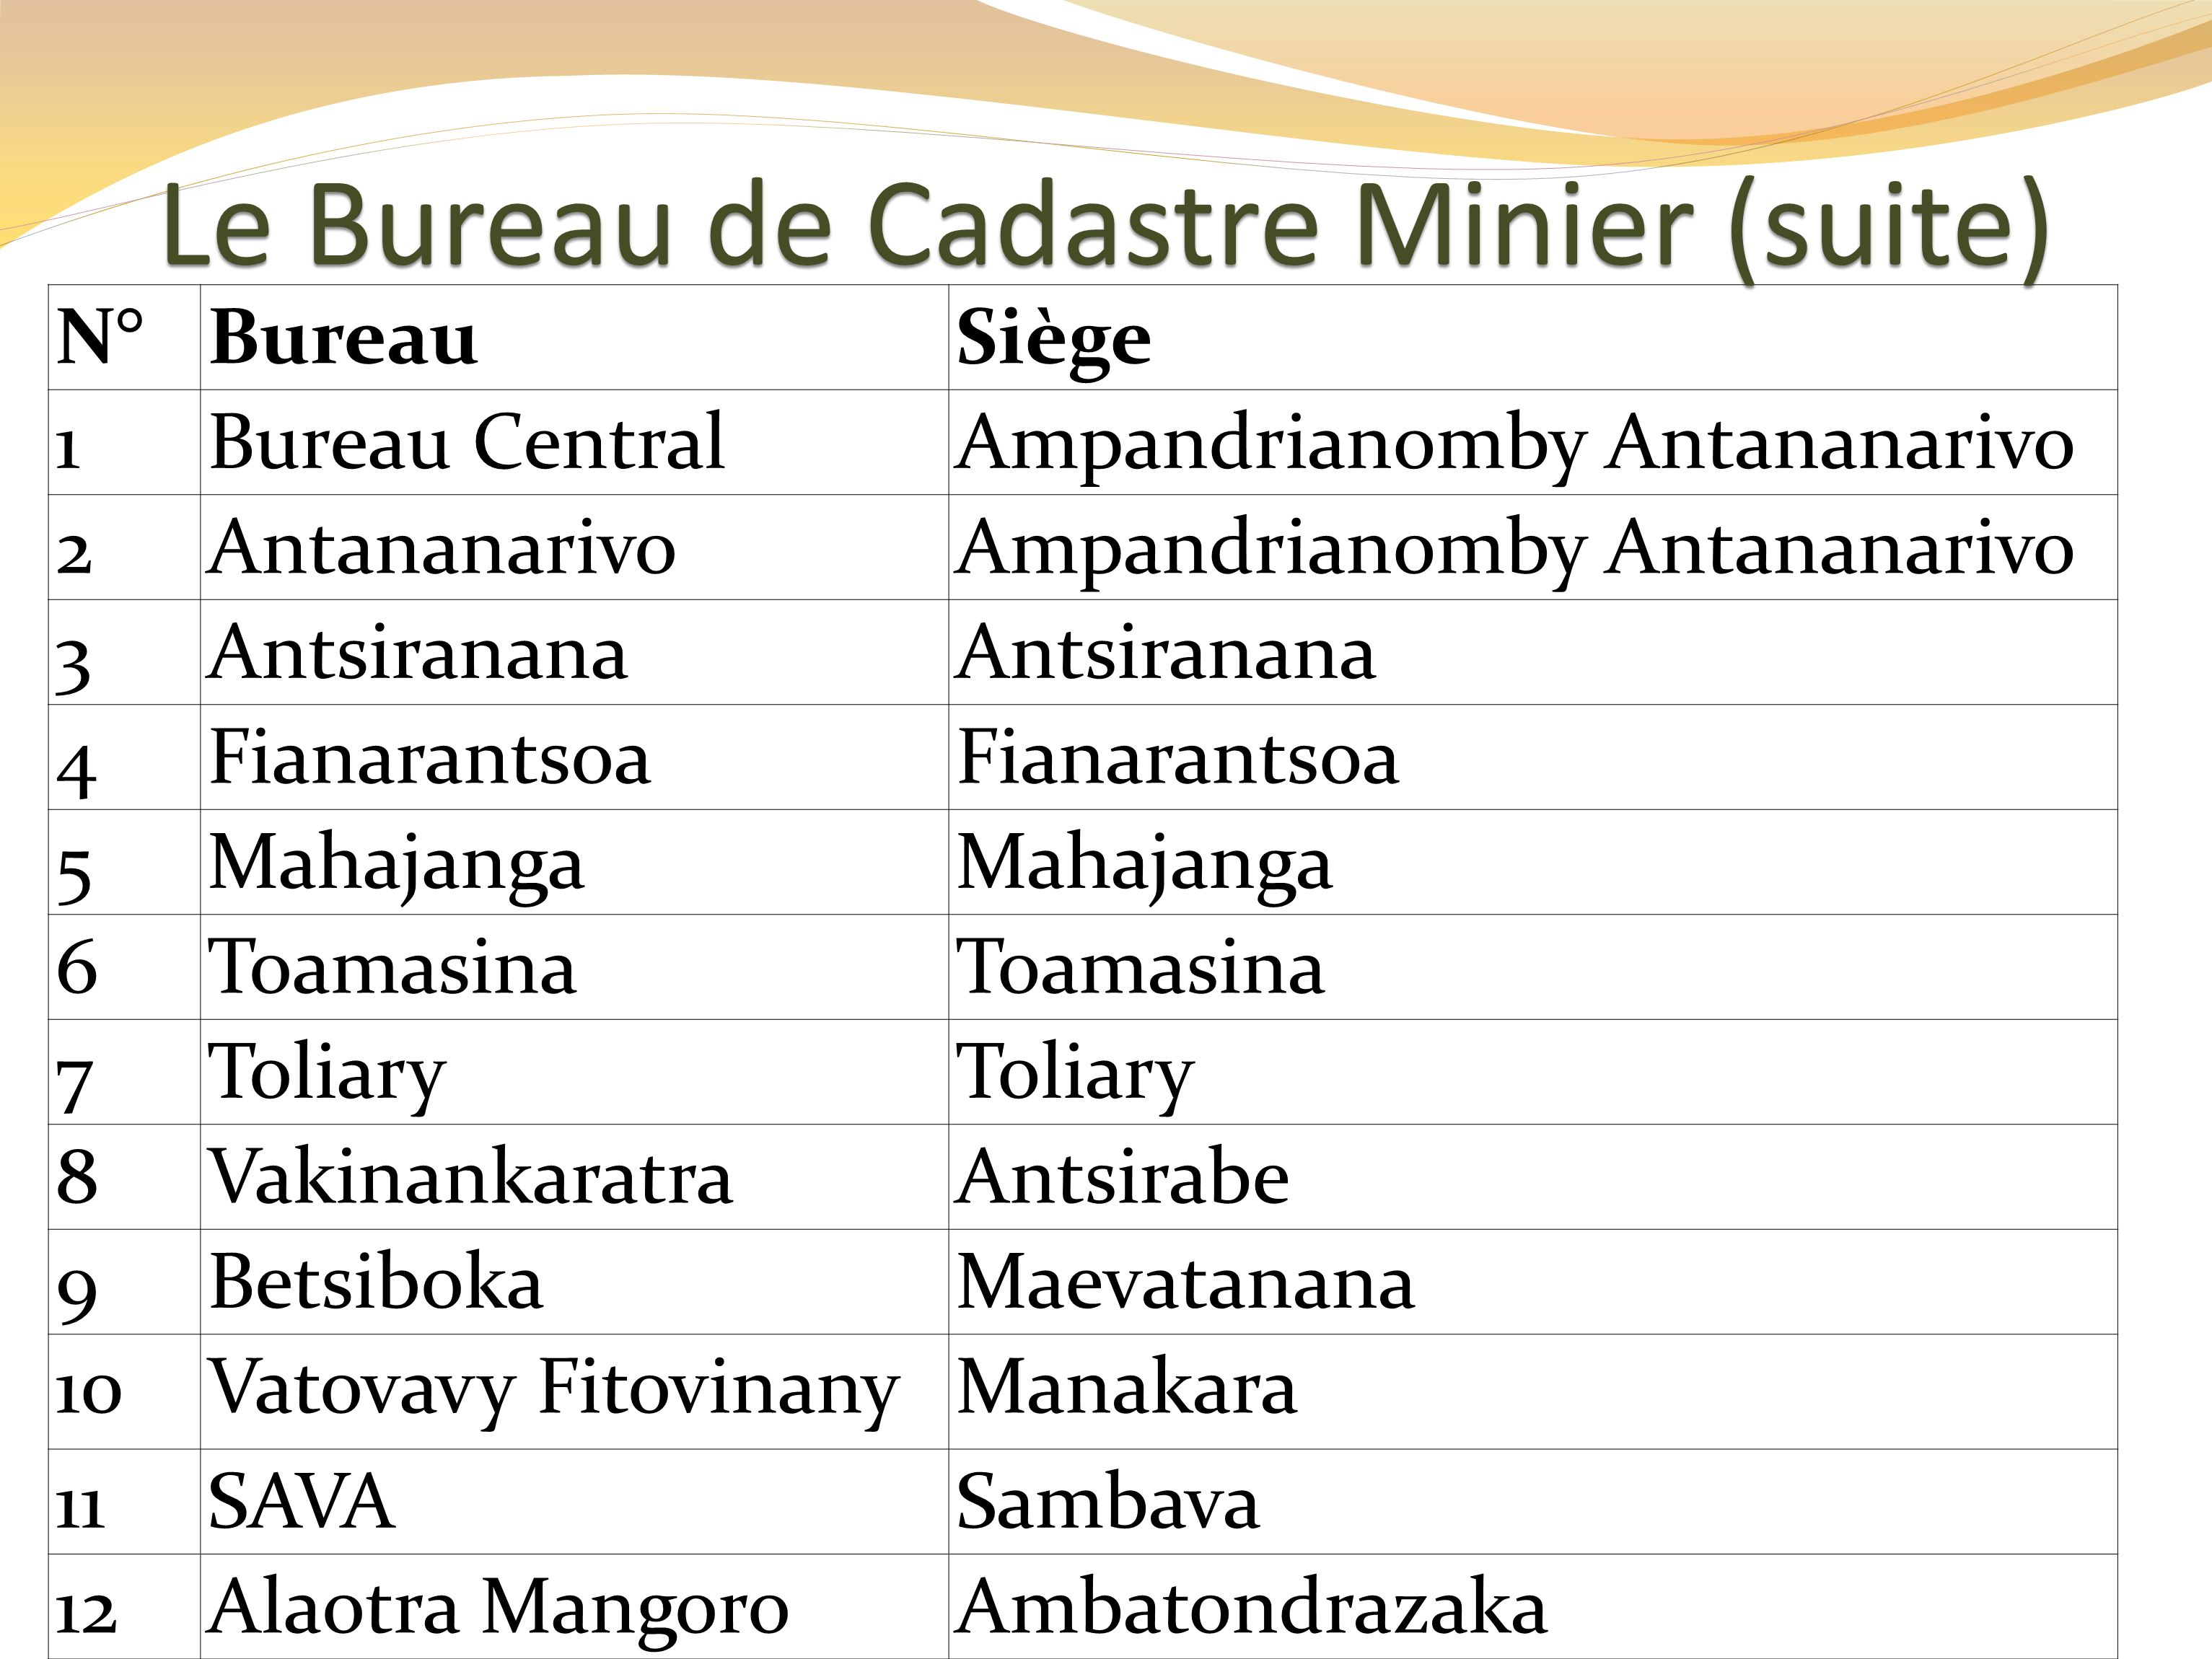 Le Bureau de Cadastre Minier (suite)